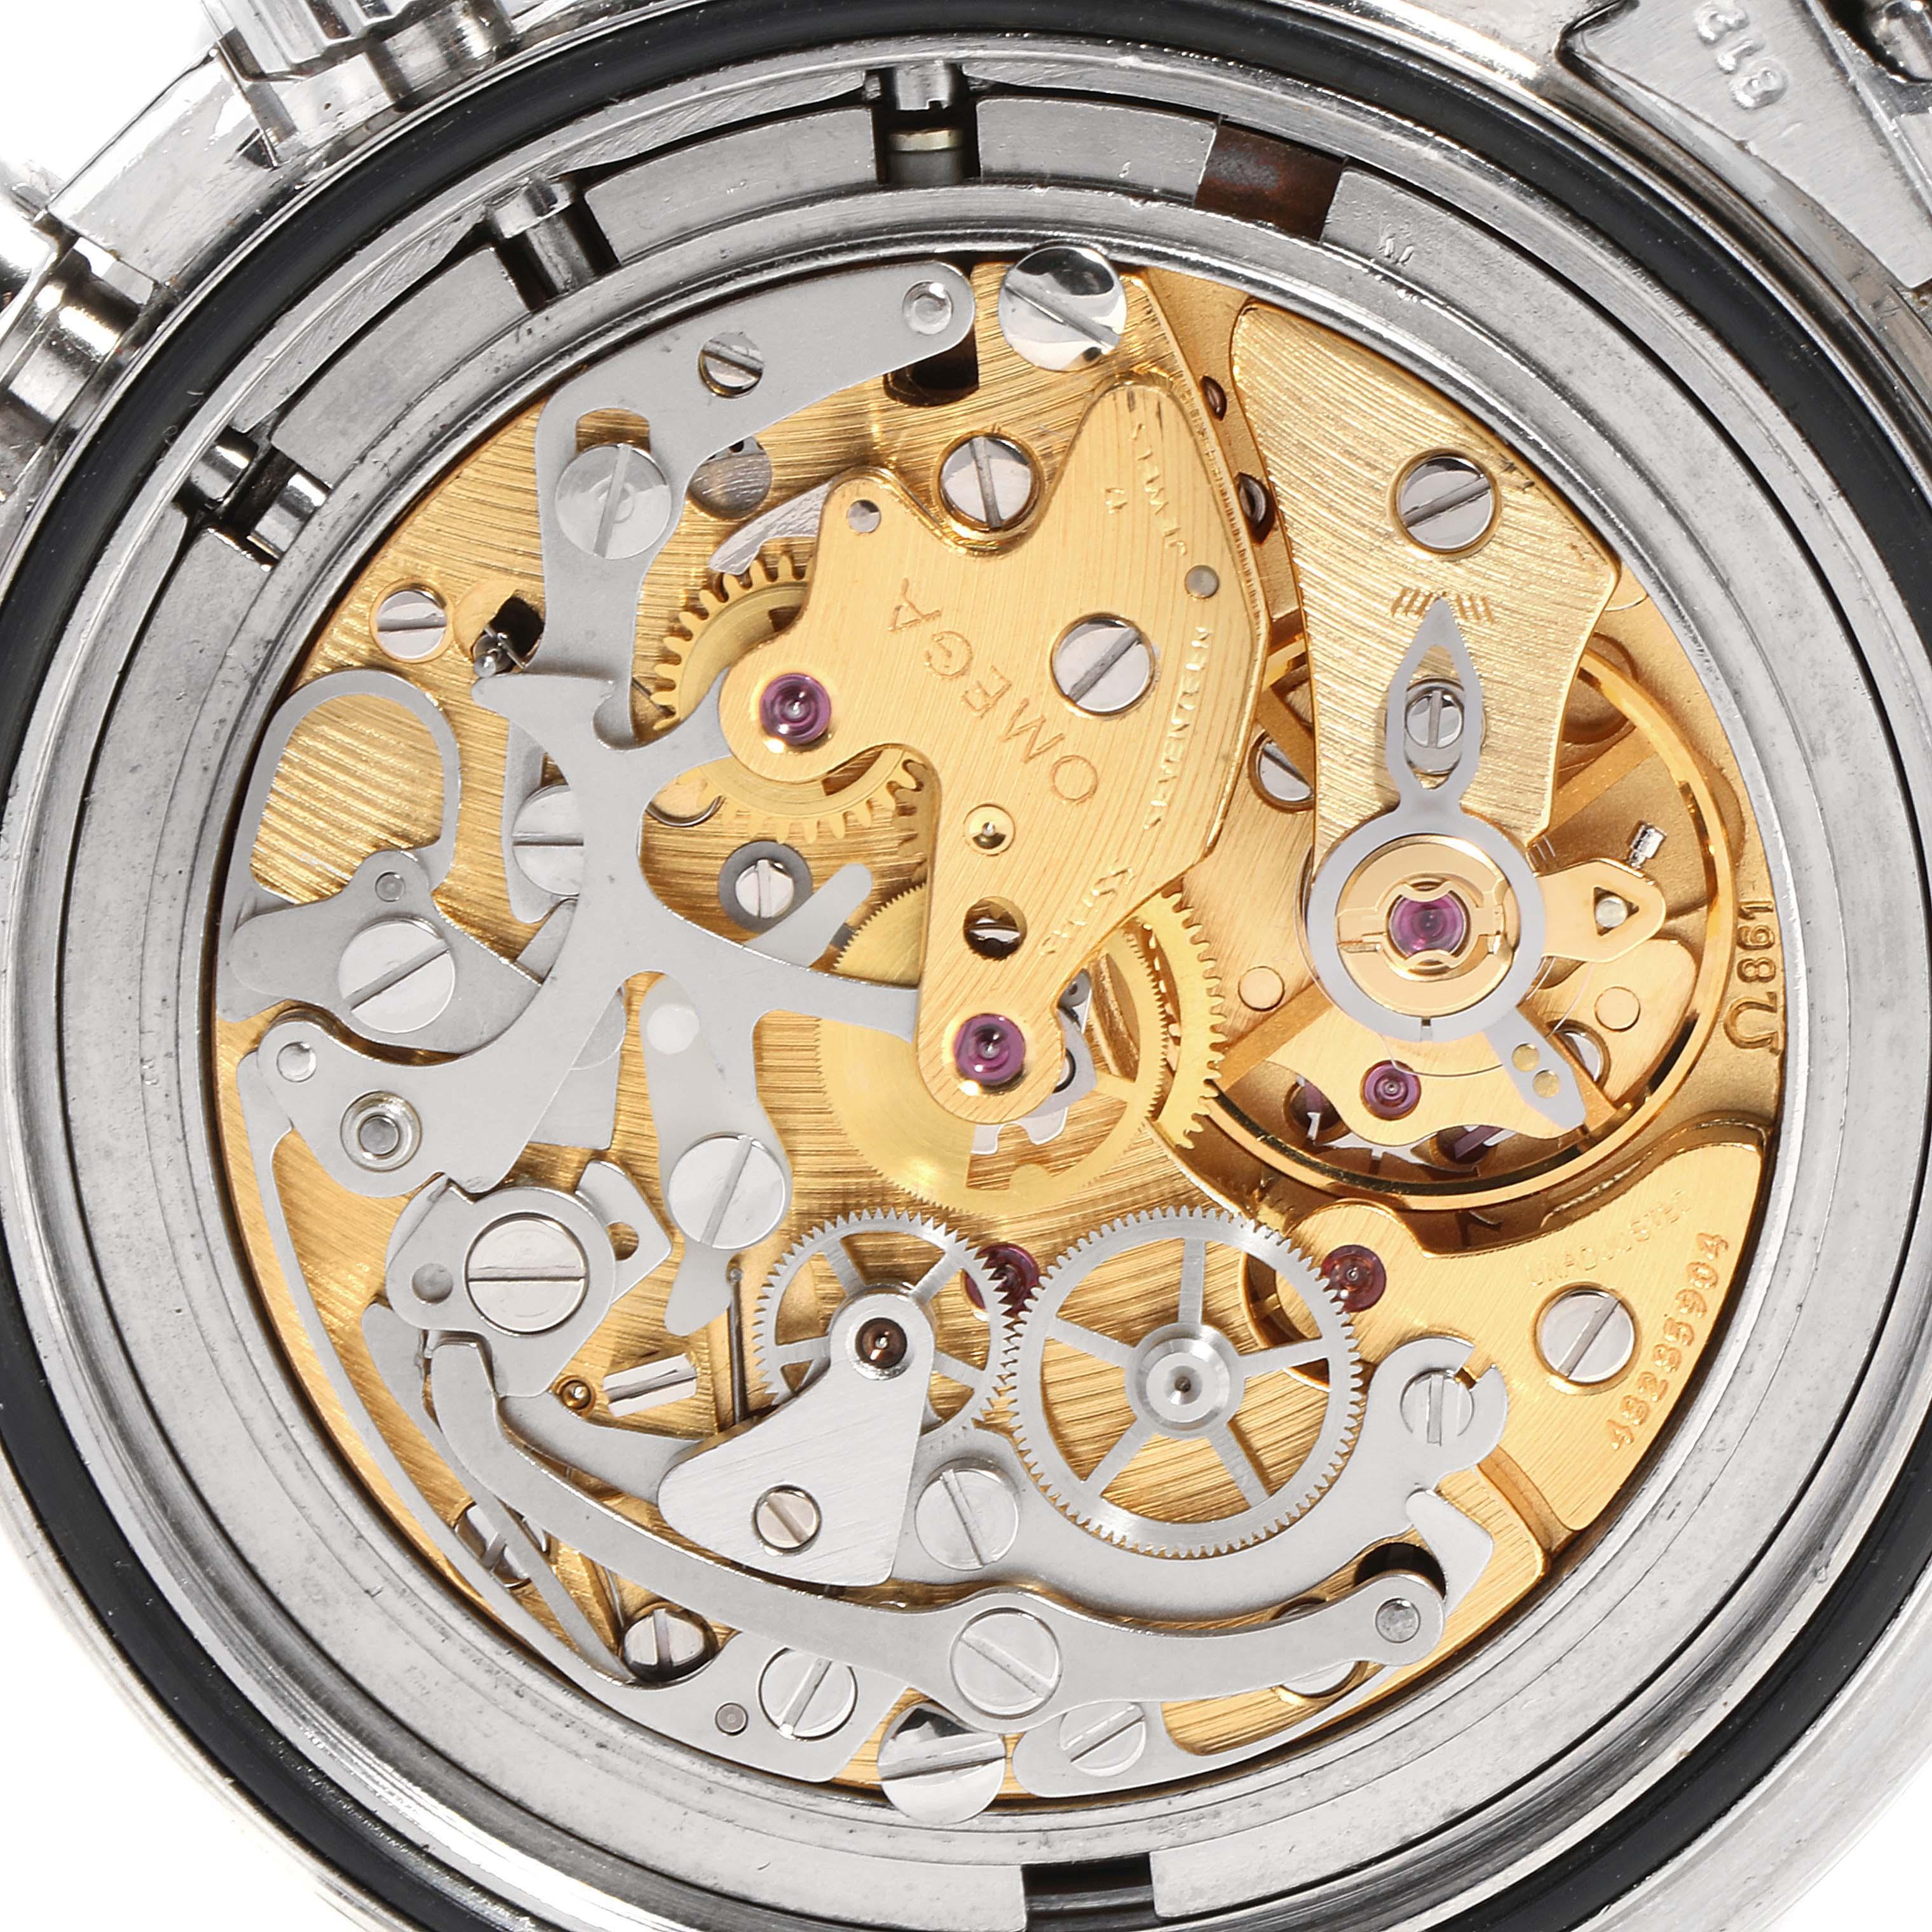 Omega Speedmaster Vintage MoonWatch Caliber 861 Mens Watch 145.022 SwissWatchExpo